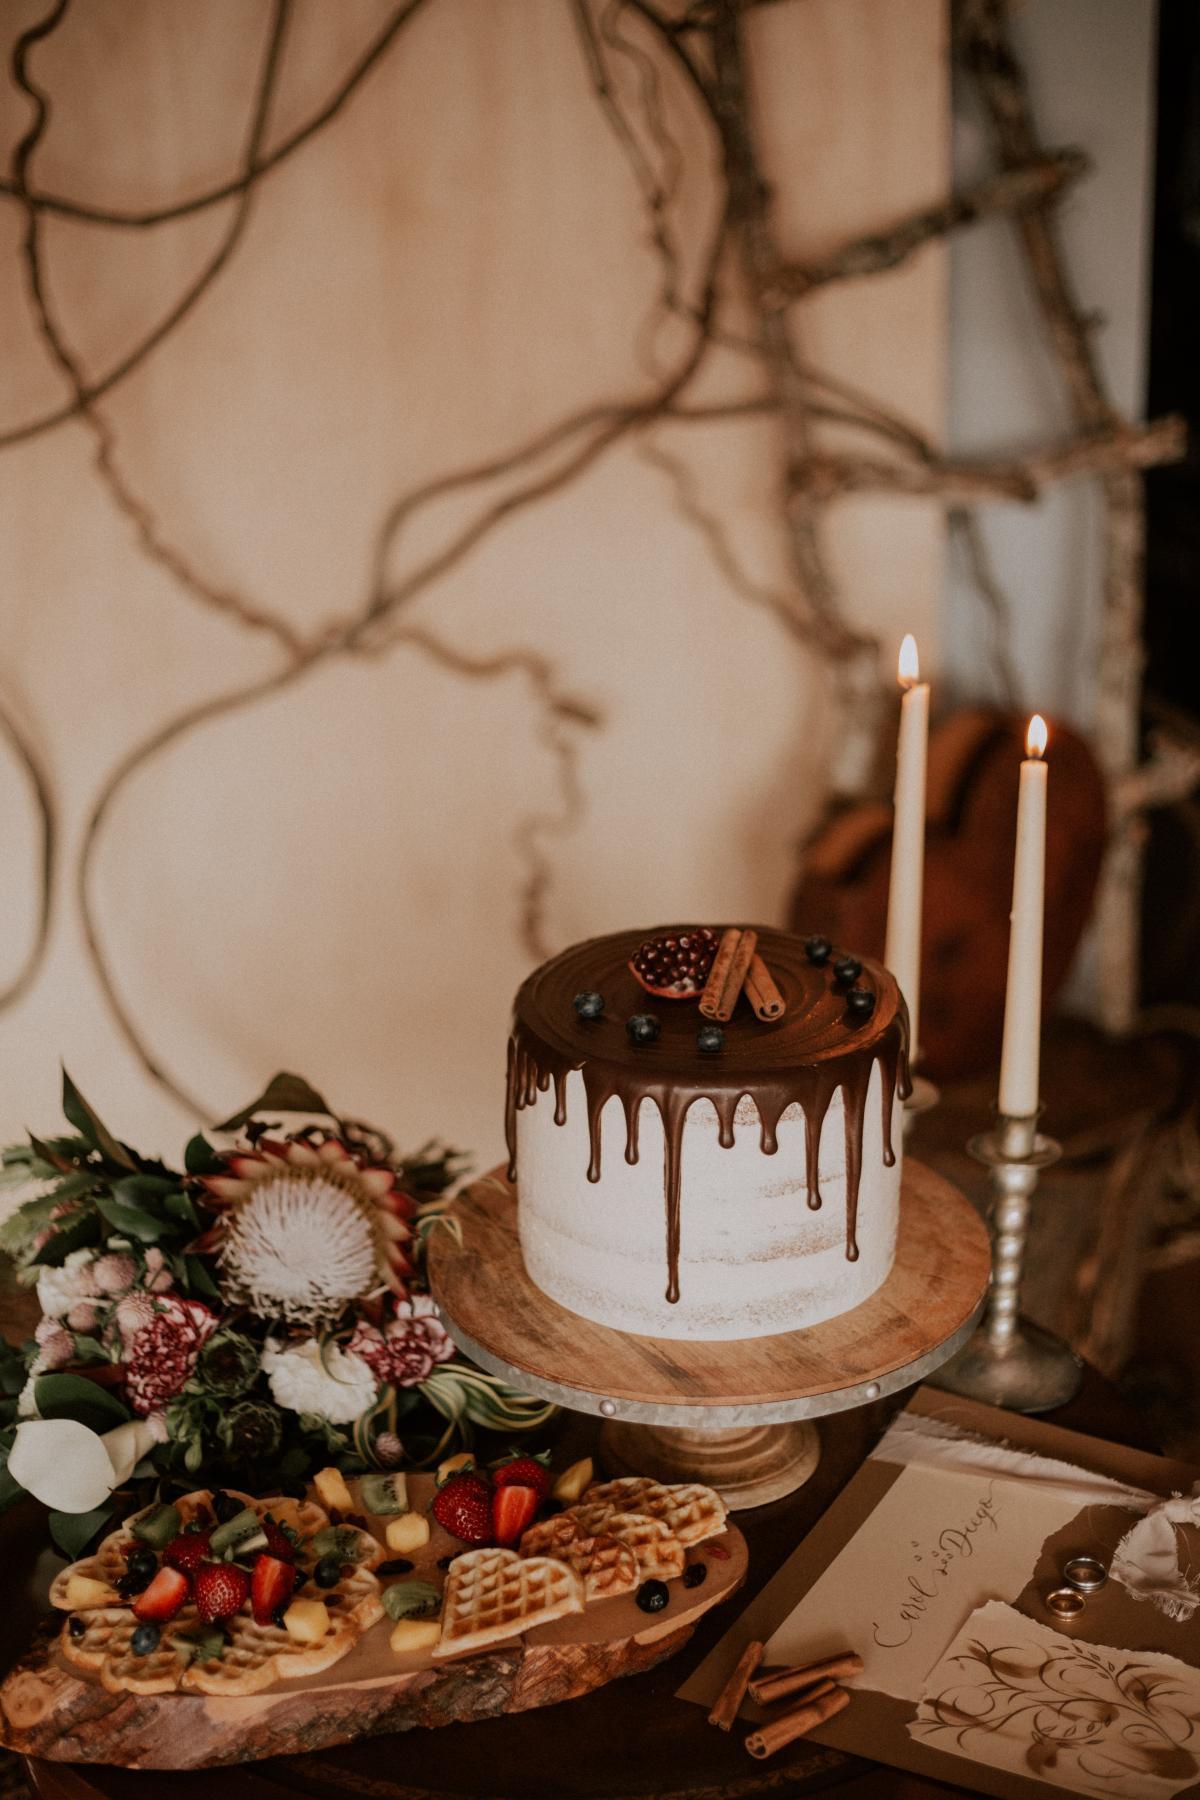 Chocolate Dessert Cake #422836